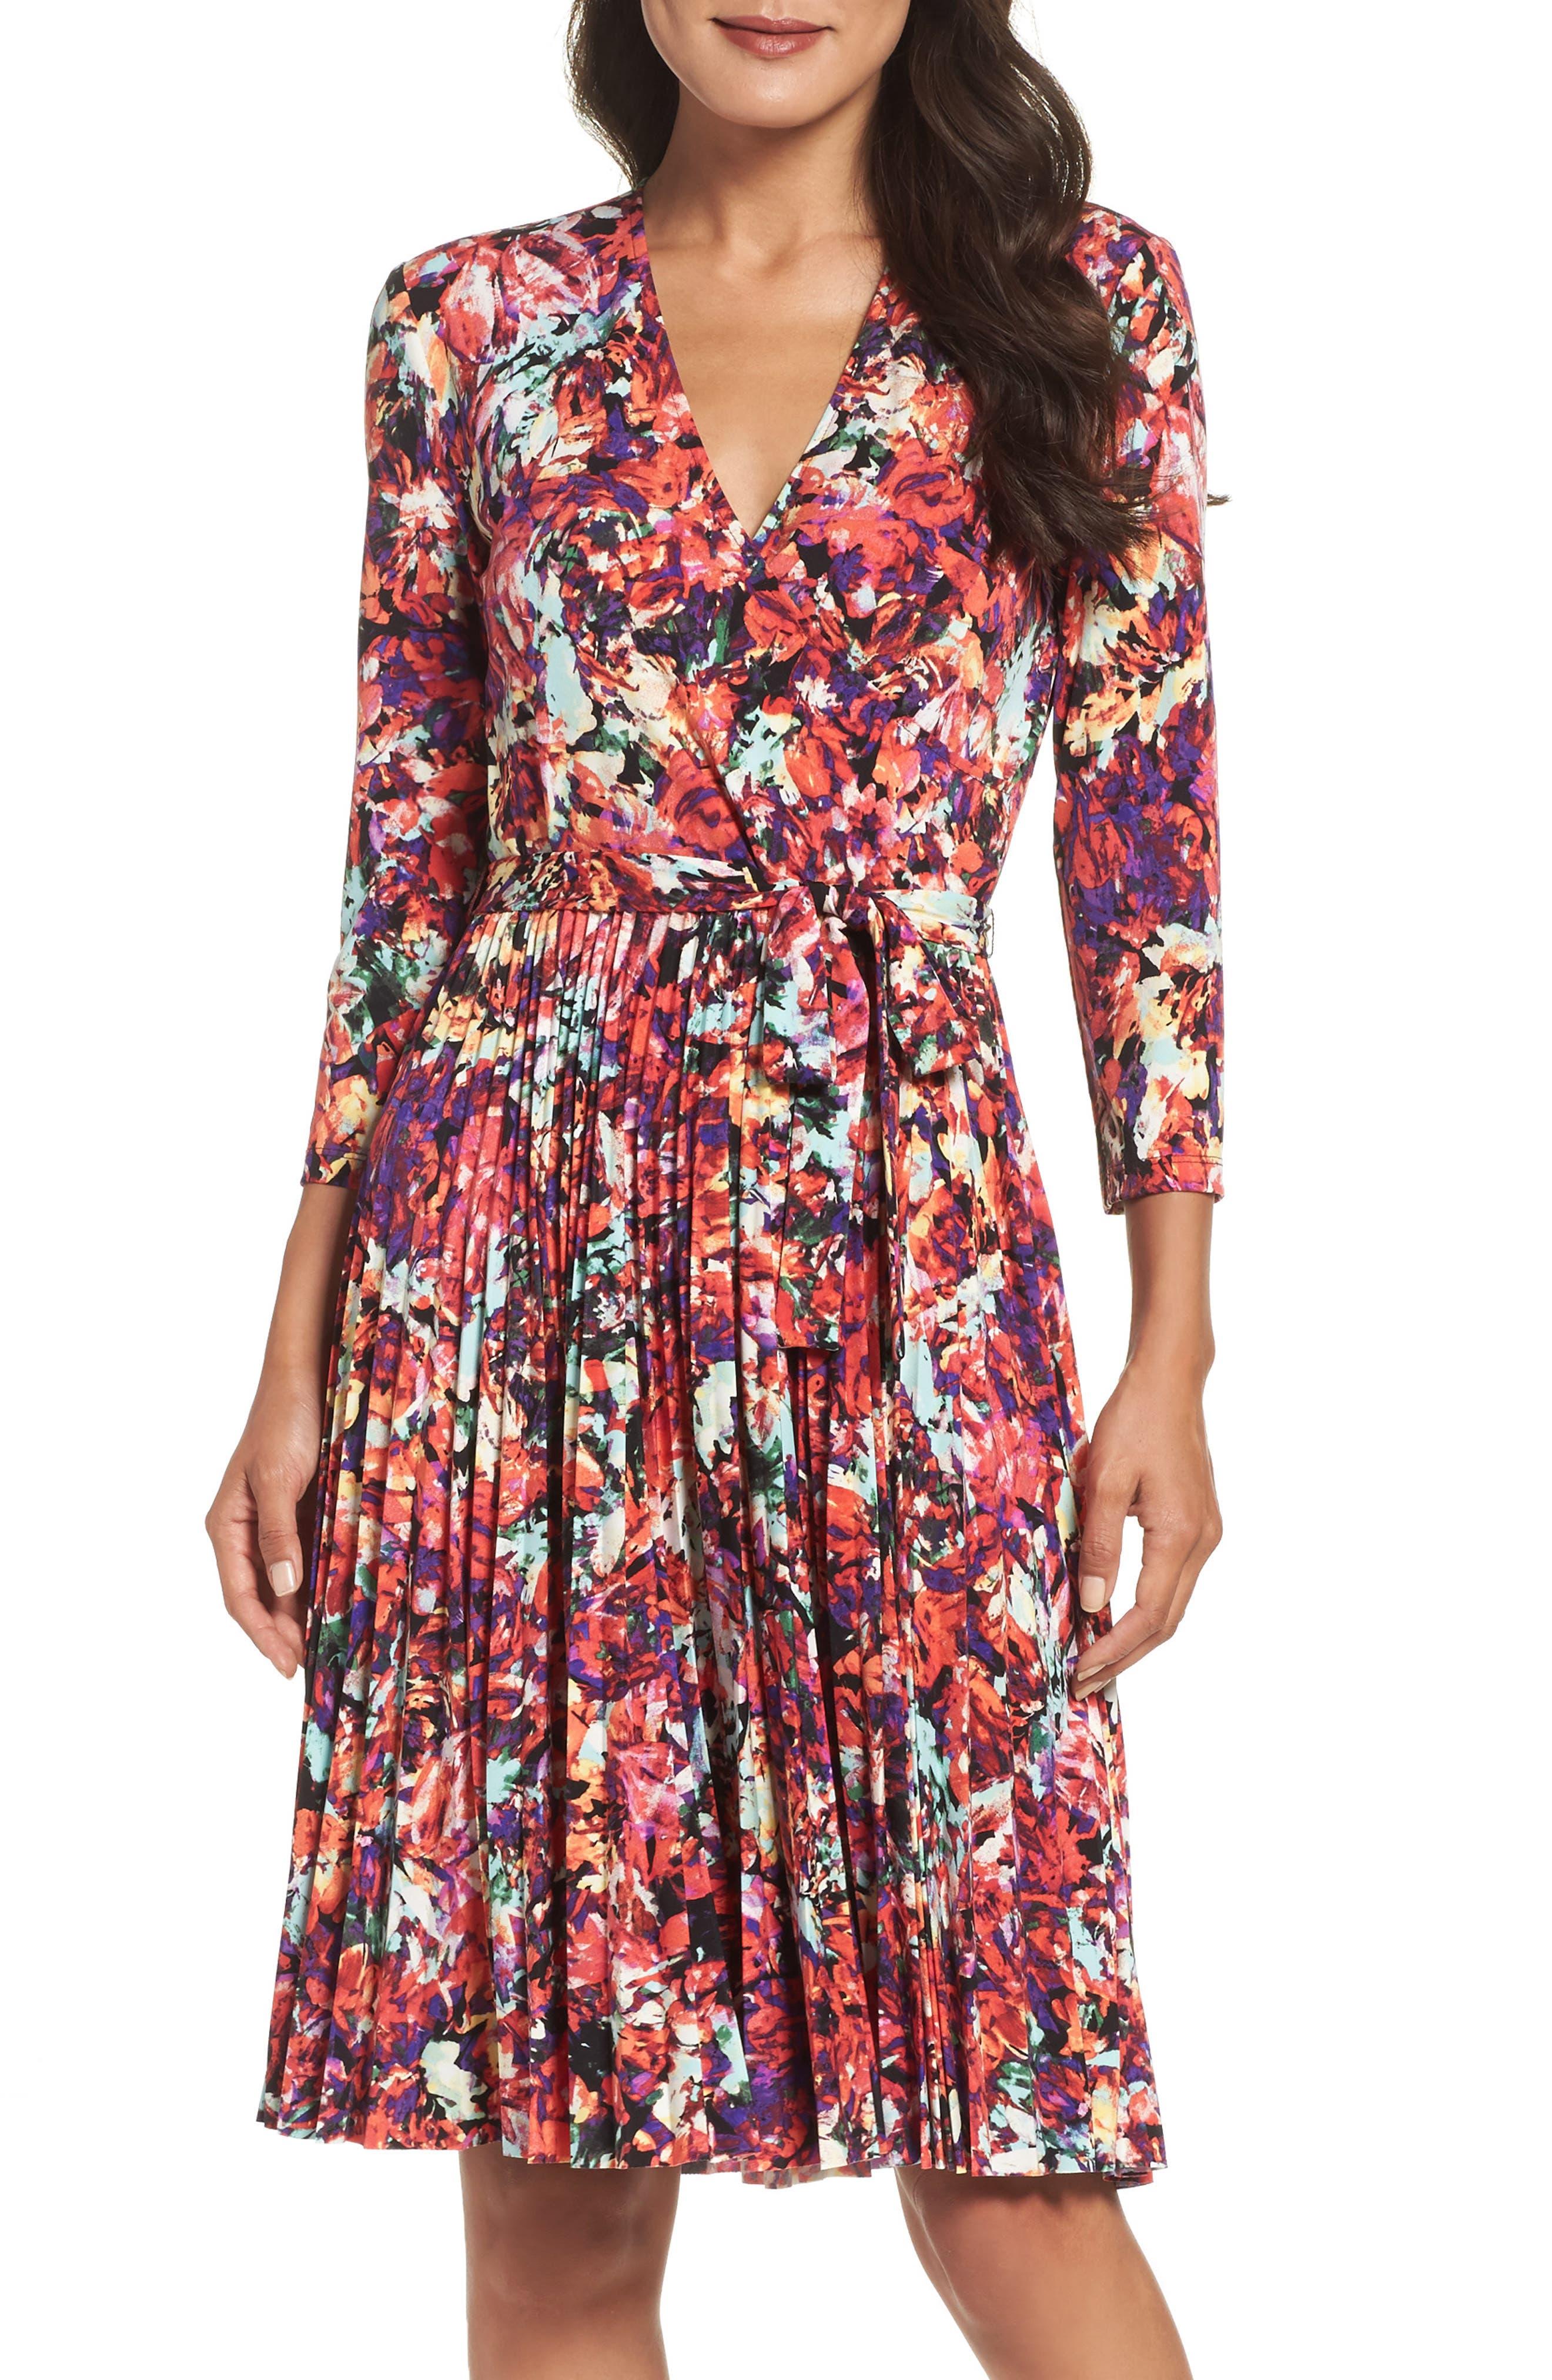 Alternate Image 1 Selected - Maggy London Print Fit & Flare Dress (Regular & Petite)